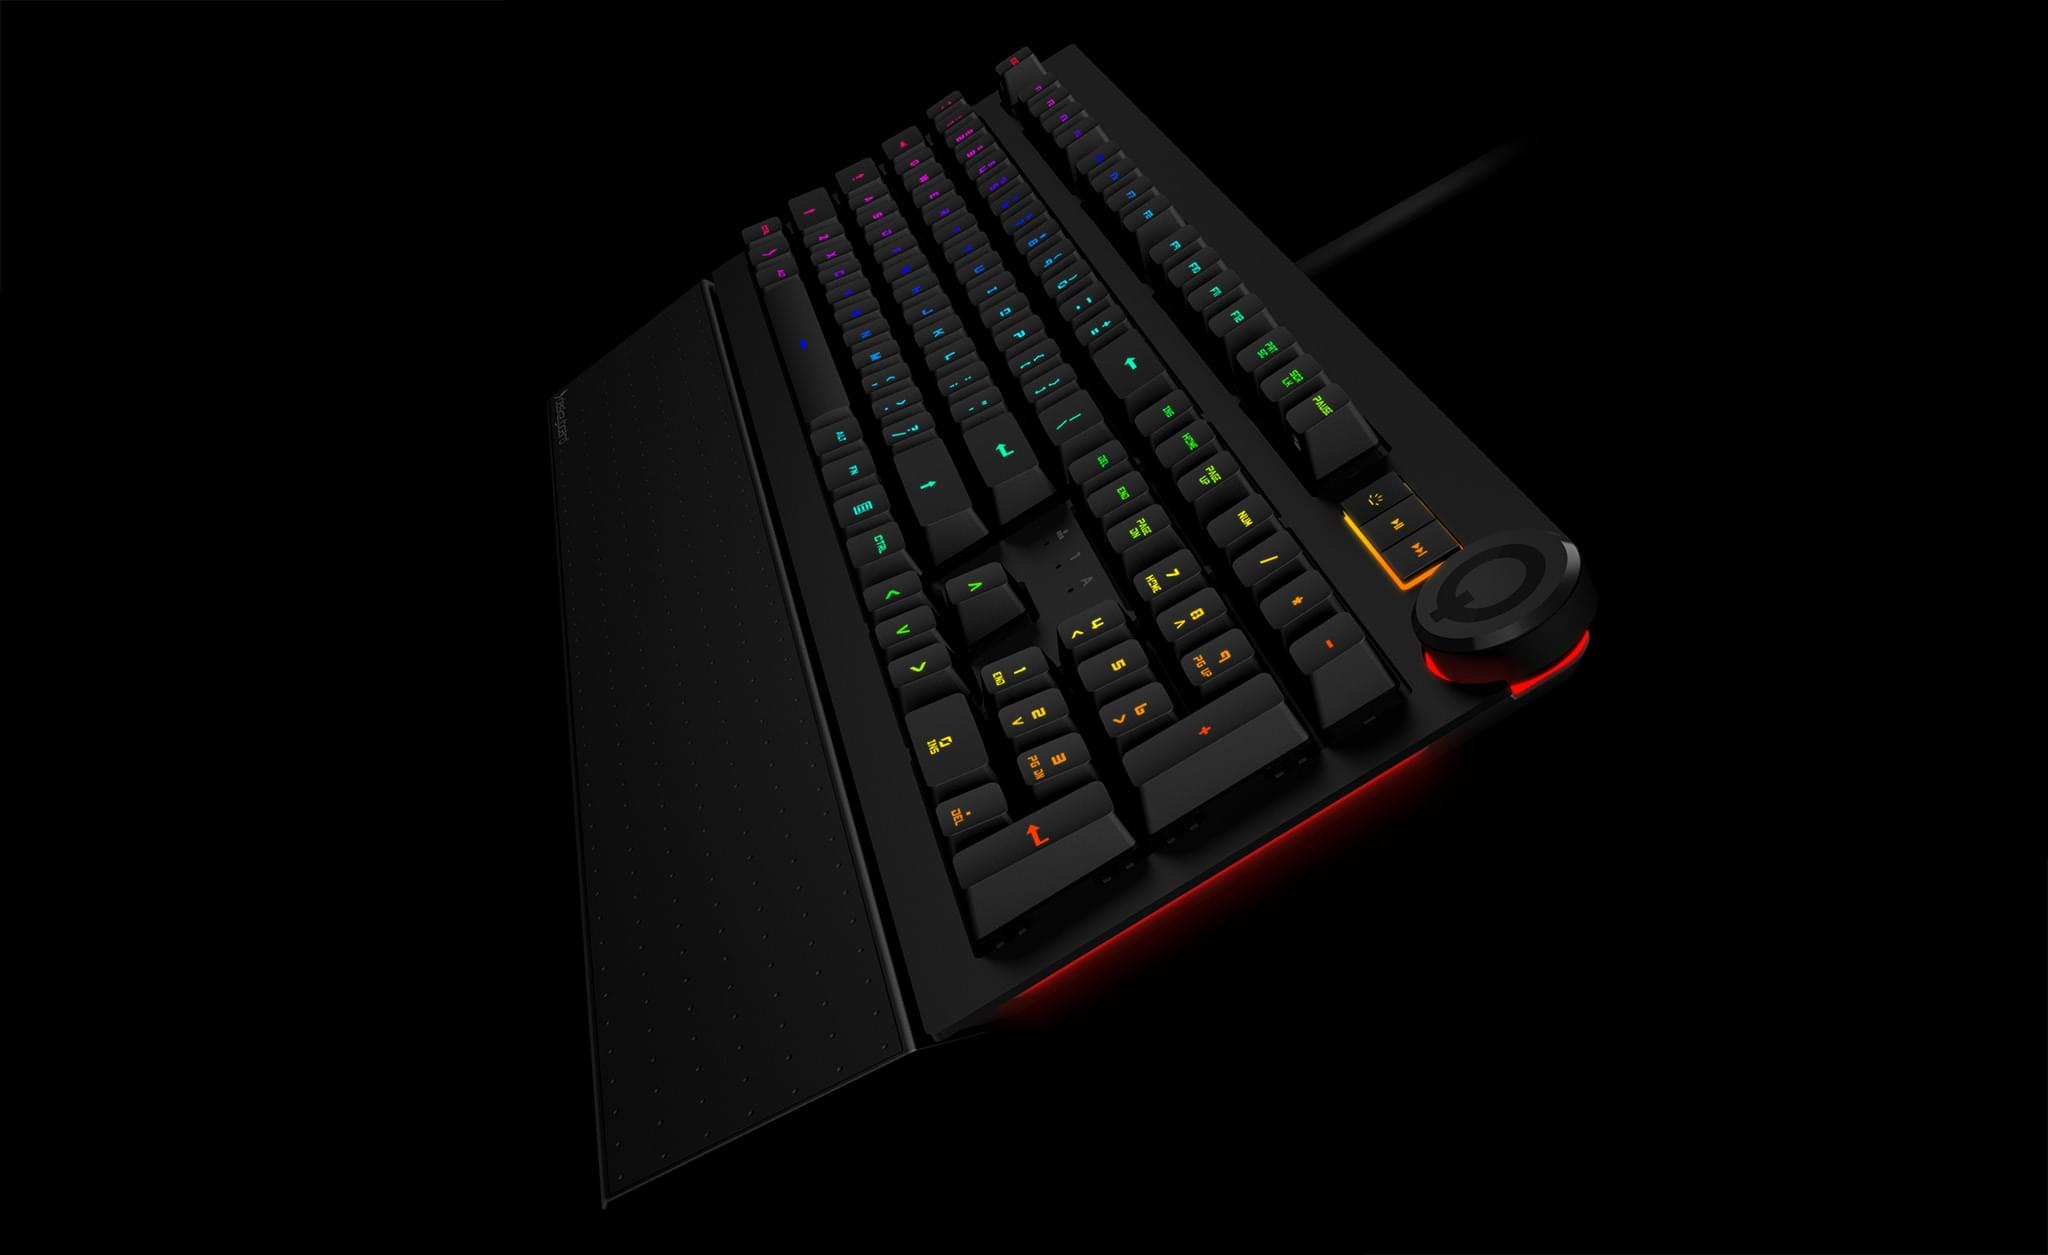 Das keyboard 5Q Smart Keyboard